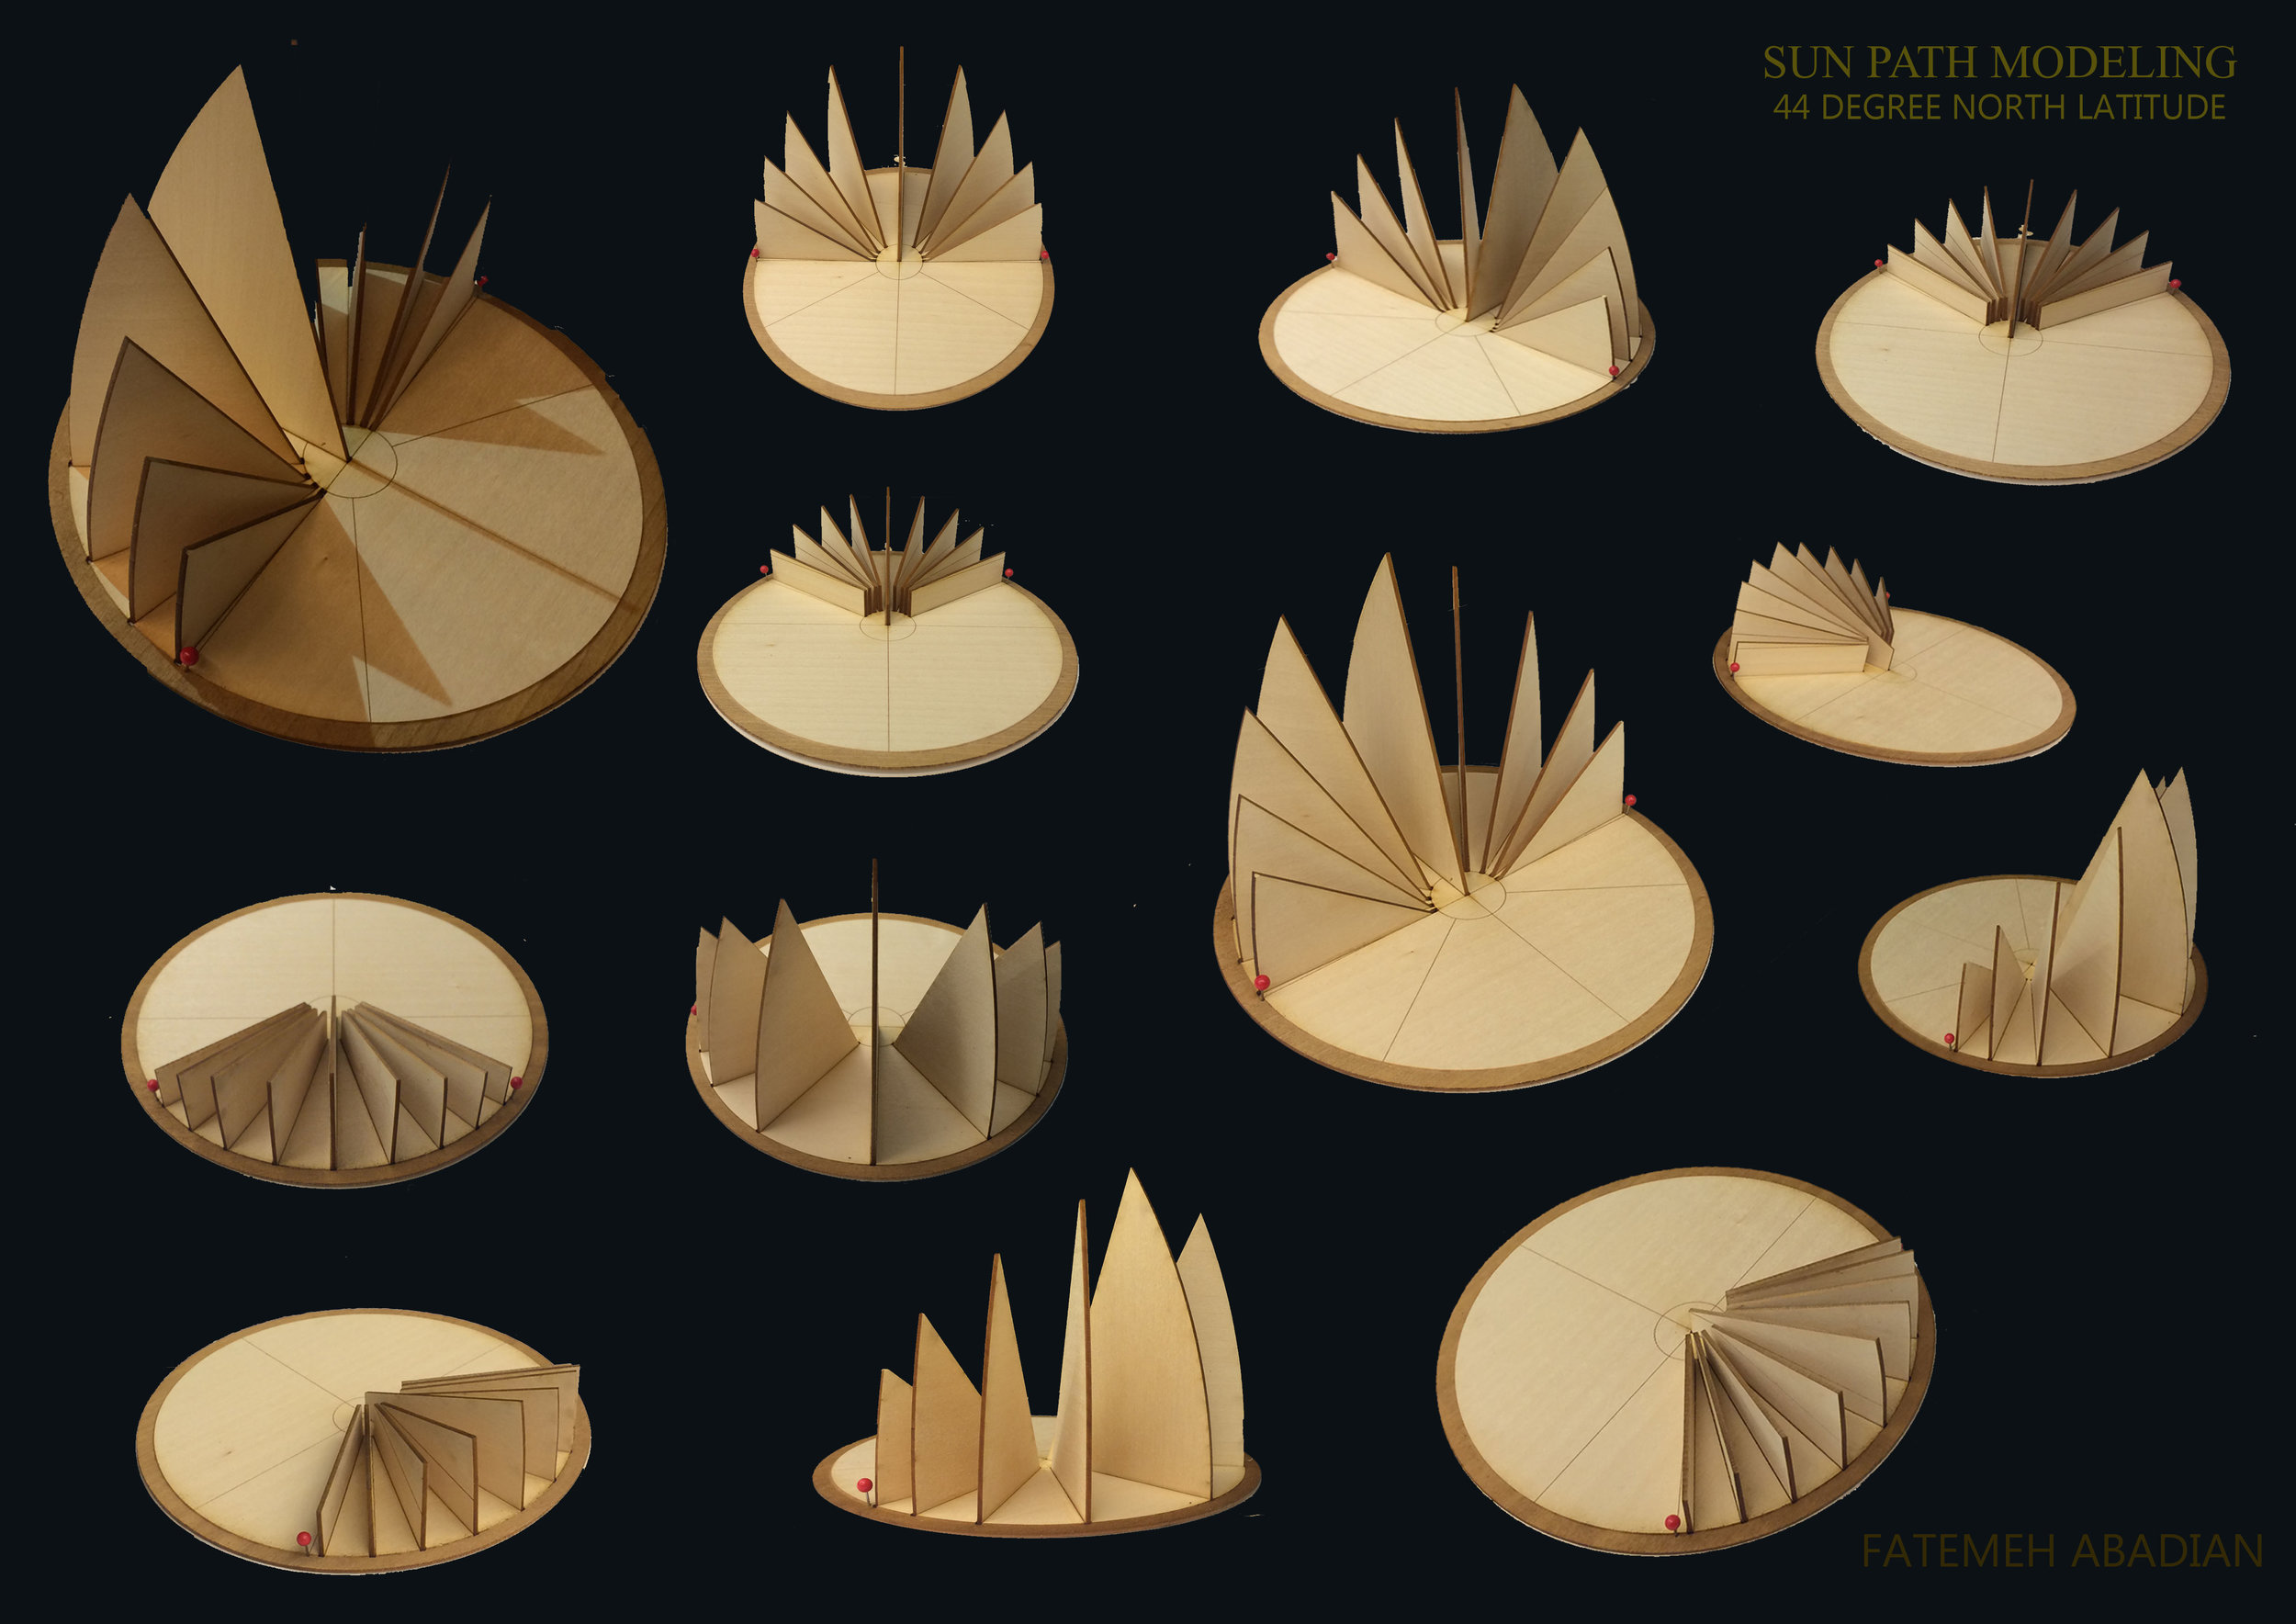 fatemeh-abadian-mps-interior-lighting-design-projects_17456254088_o.jpg